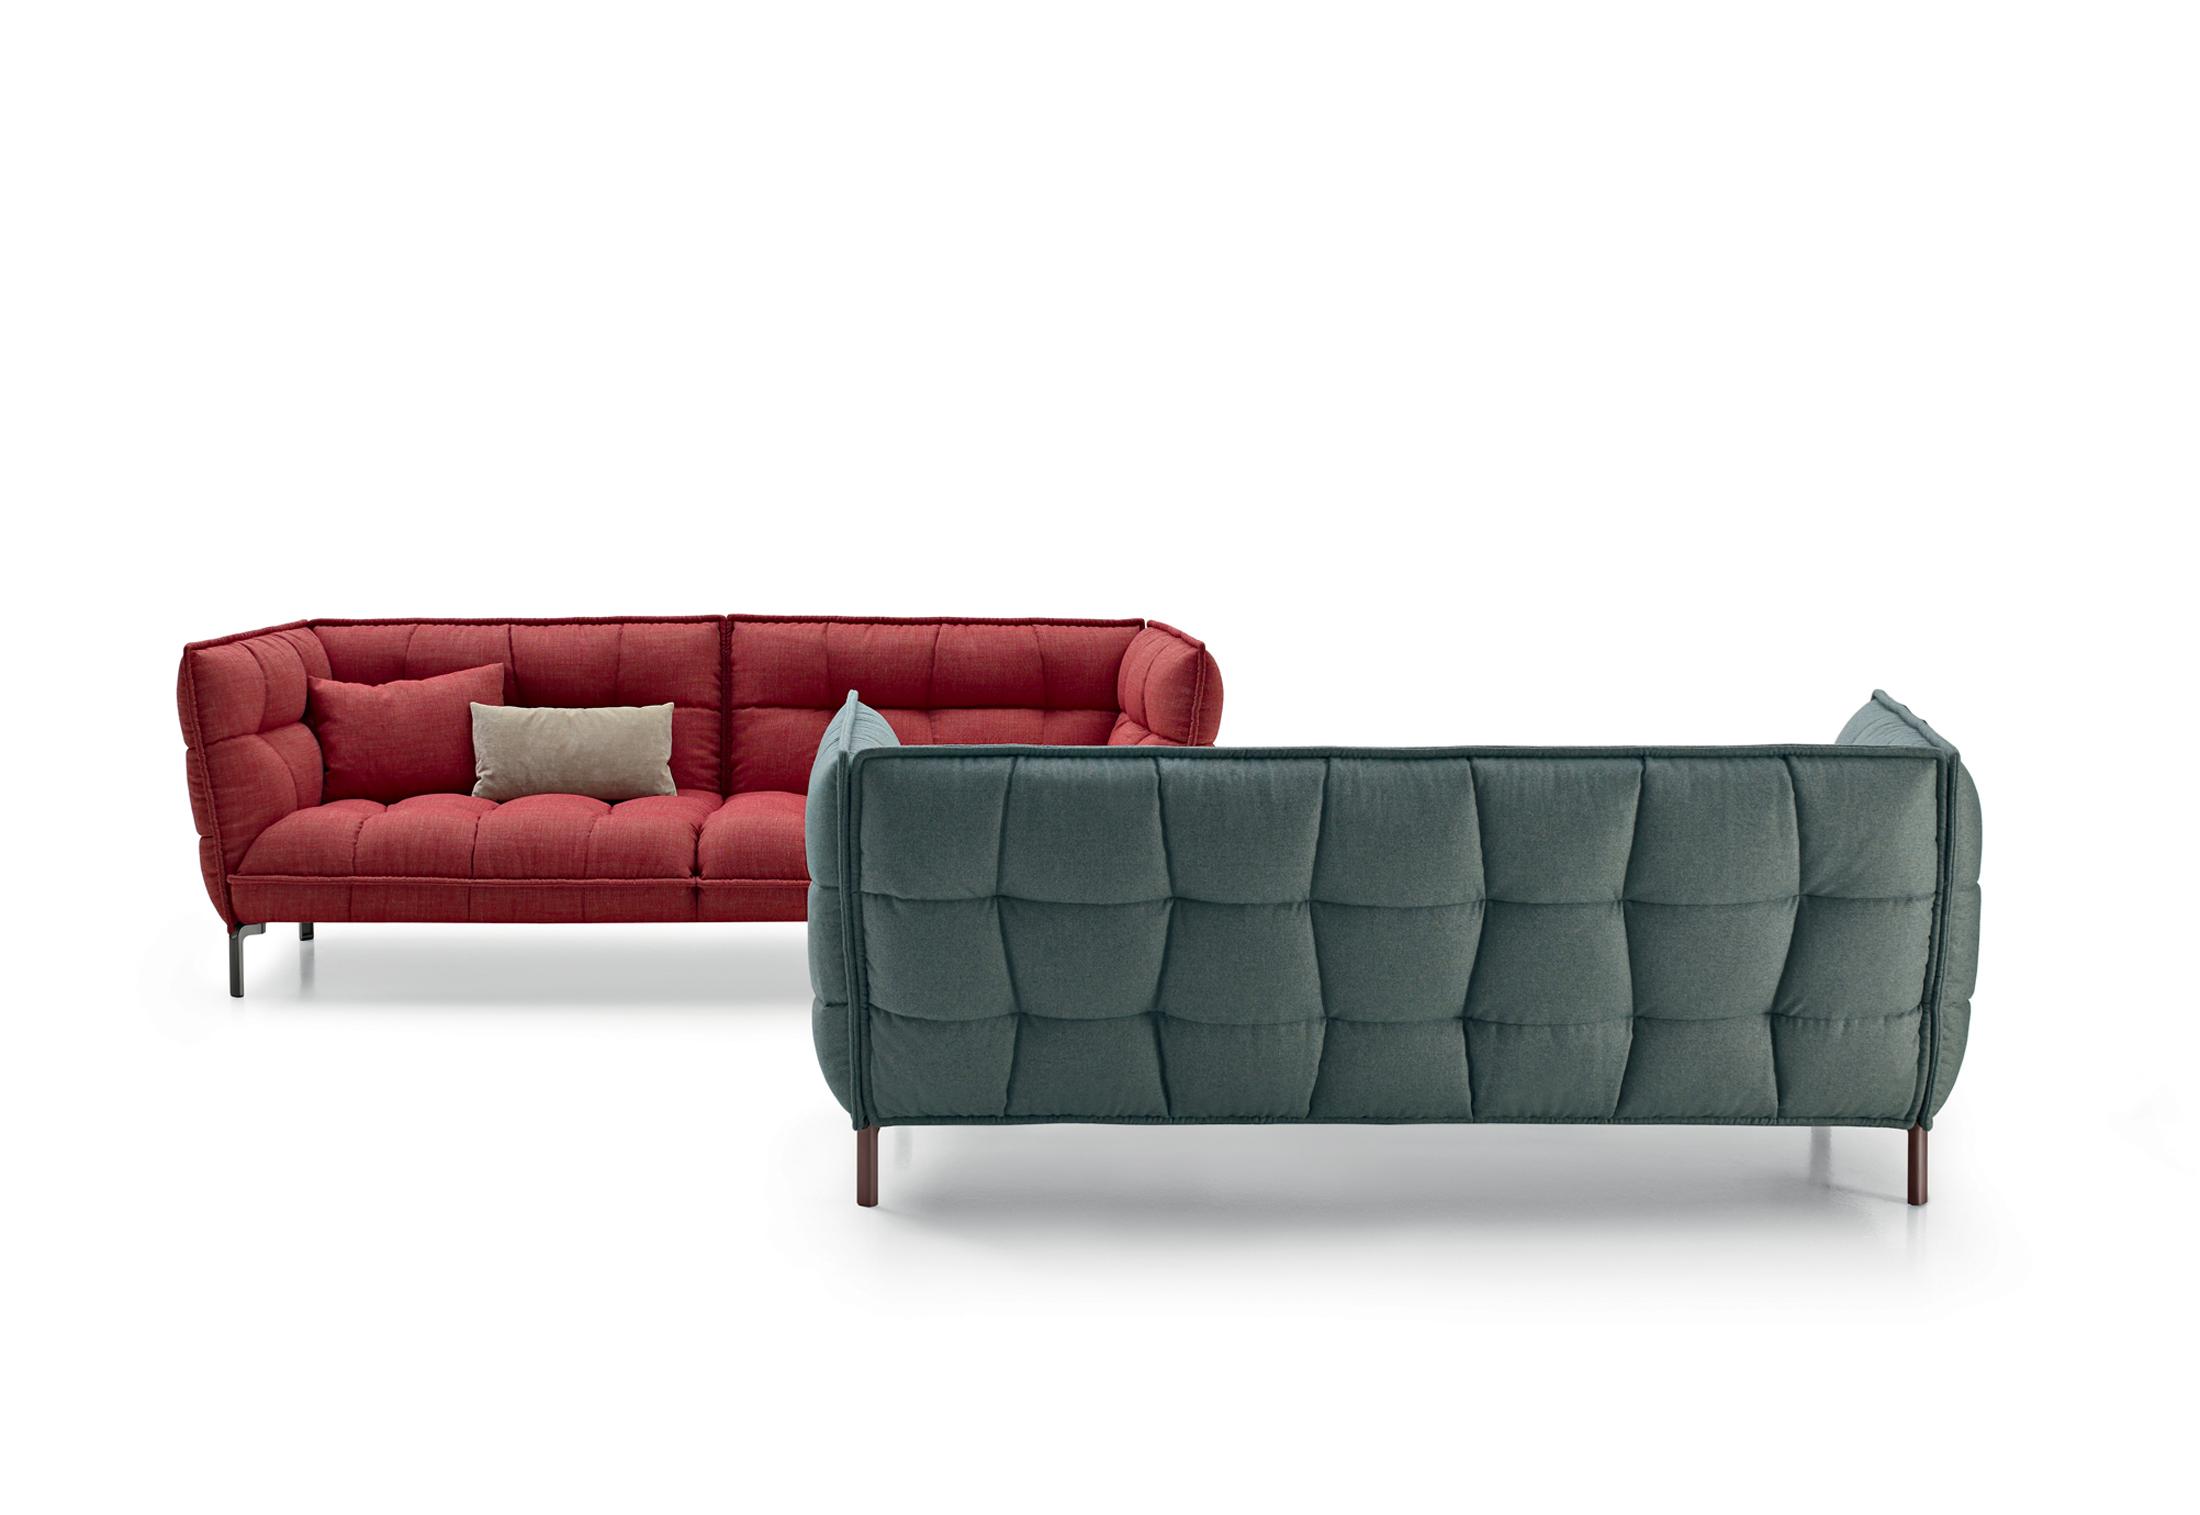 Husk Sofa By B Amp B Italia Sohomod Blog